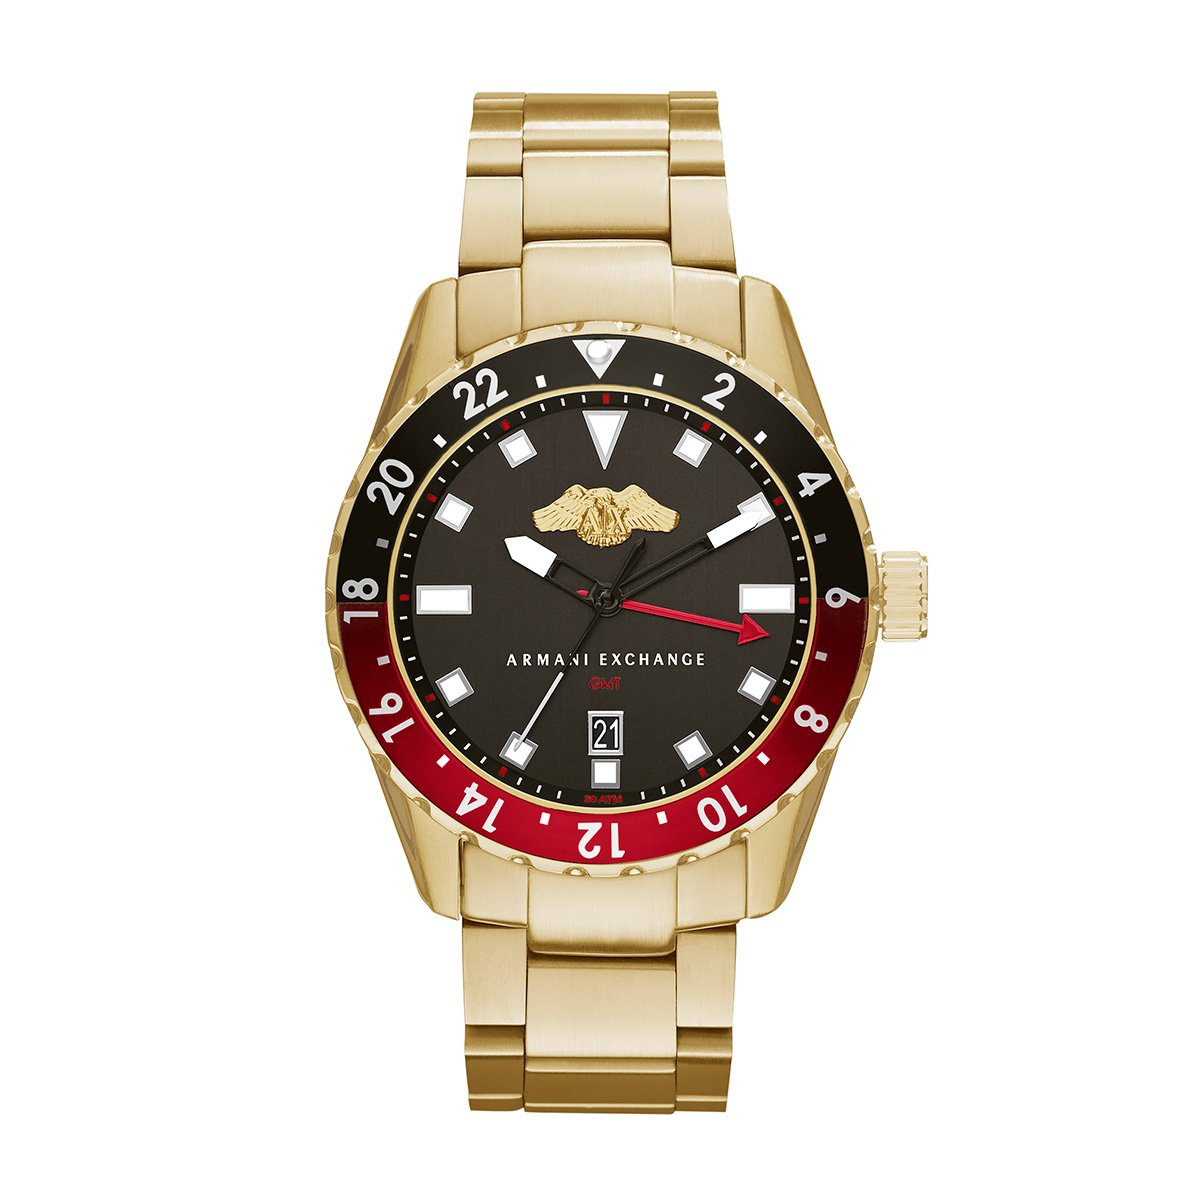 461c1938963 Relógio Armani Exchange Analógico AX7007 4PN Masculino - Compre Agora